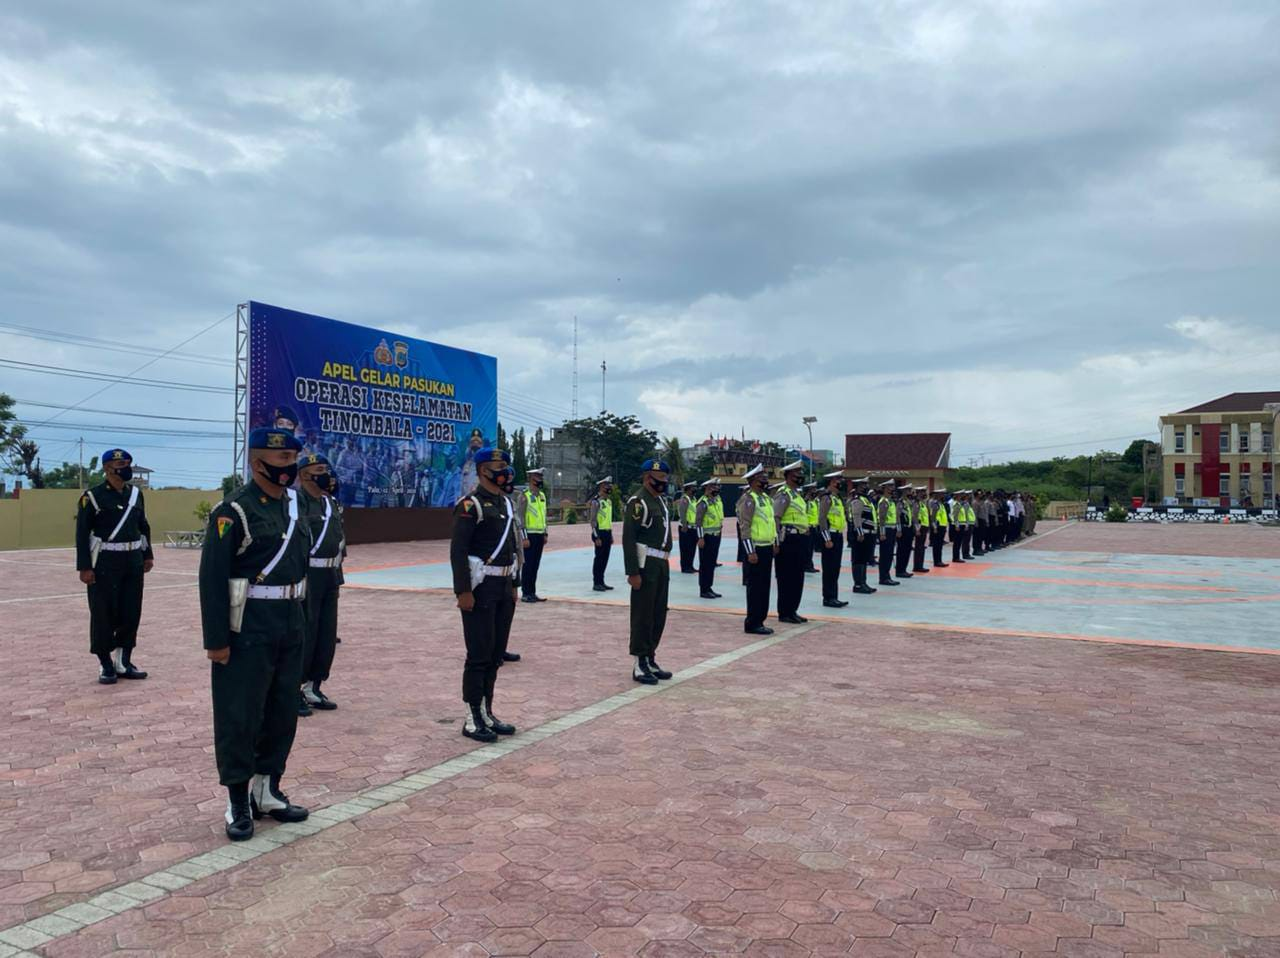 Dilarang Mudik, Polda Sulteng Gelar Operasi Keselamatan Jaya 2021